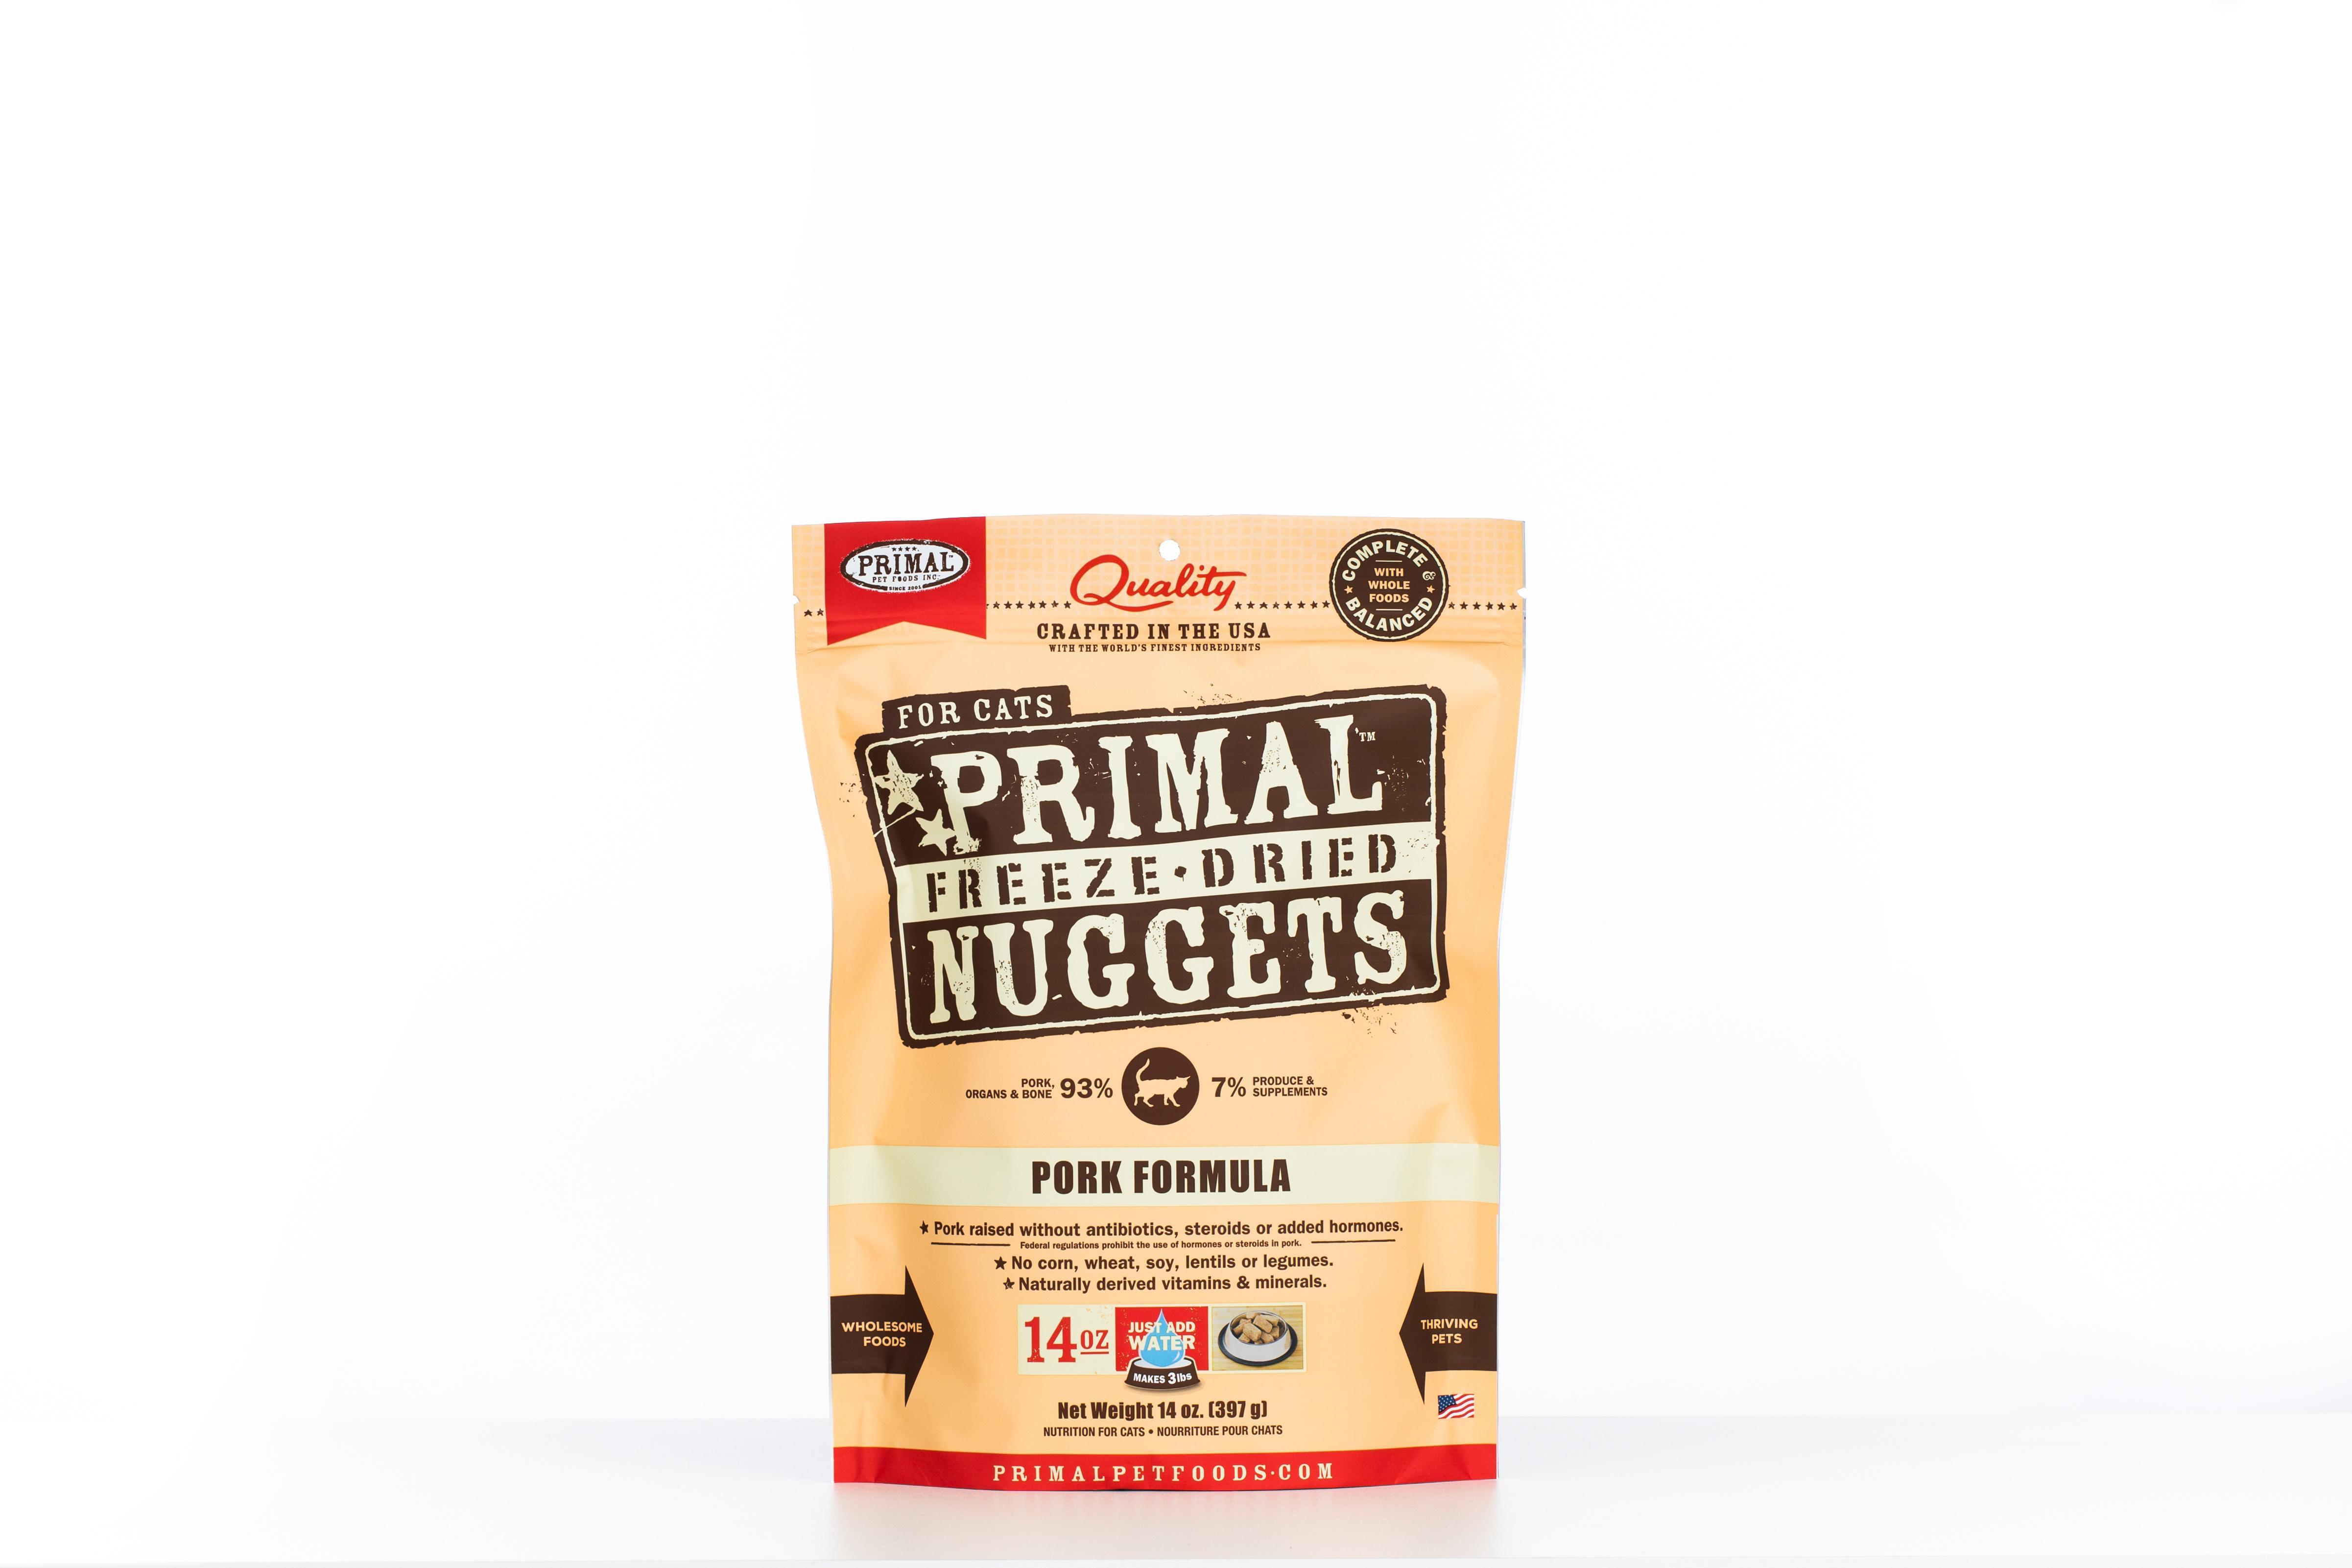 Primal Pork Formula Nuggets Grain-Free Raw Freeze-Dried Cat Food, 14-oz bag